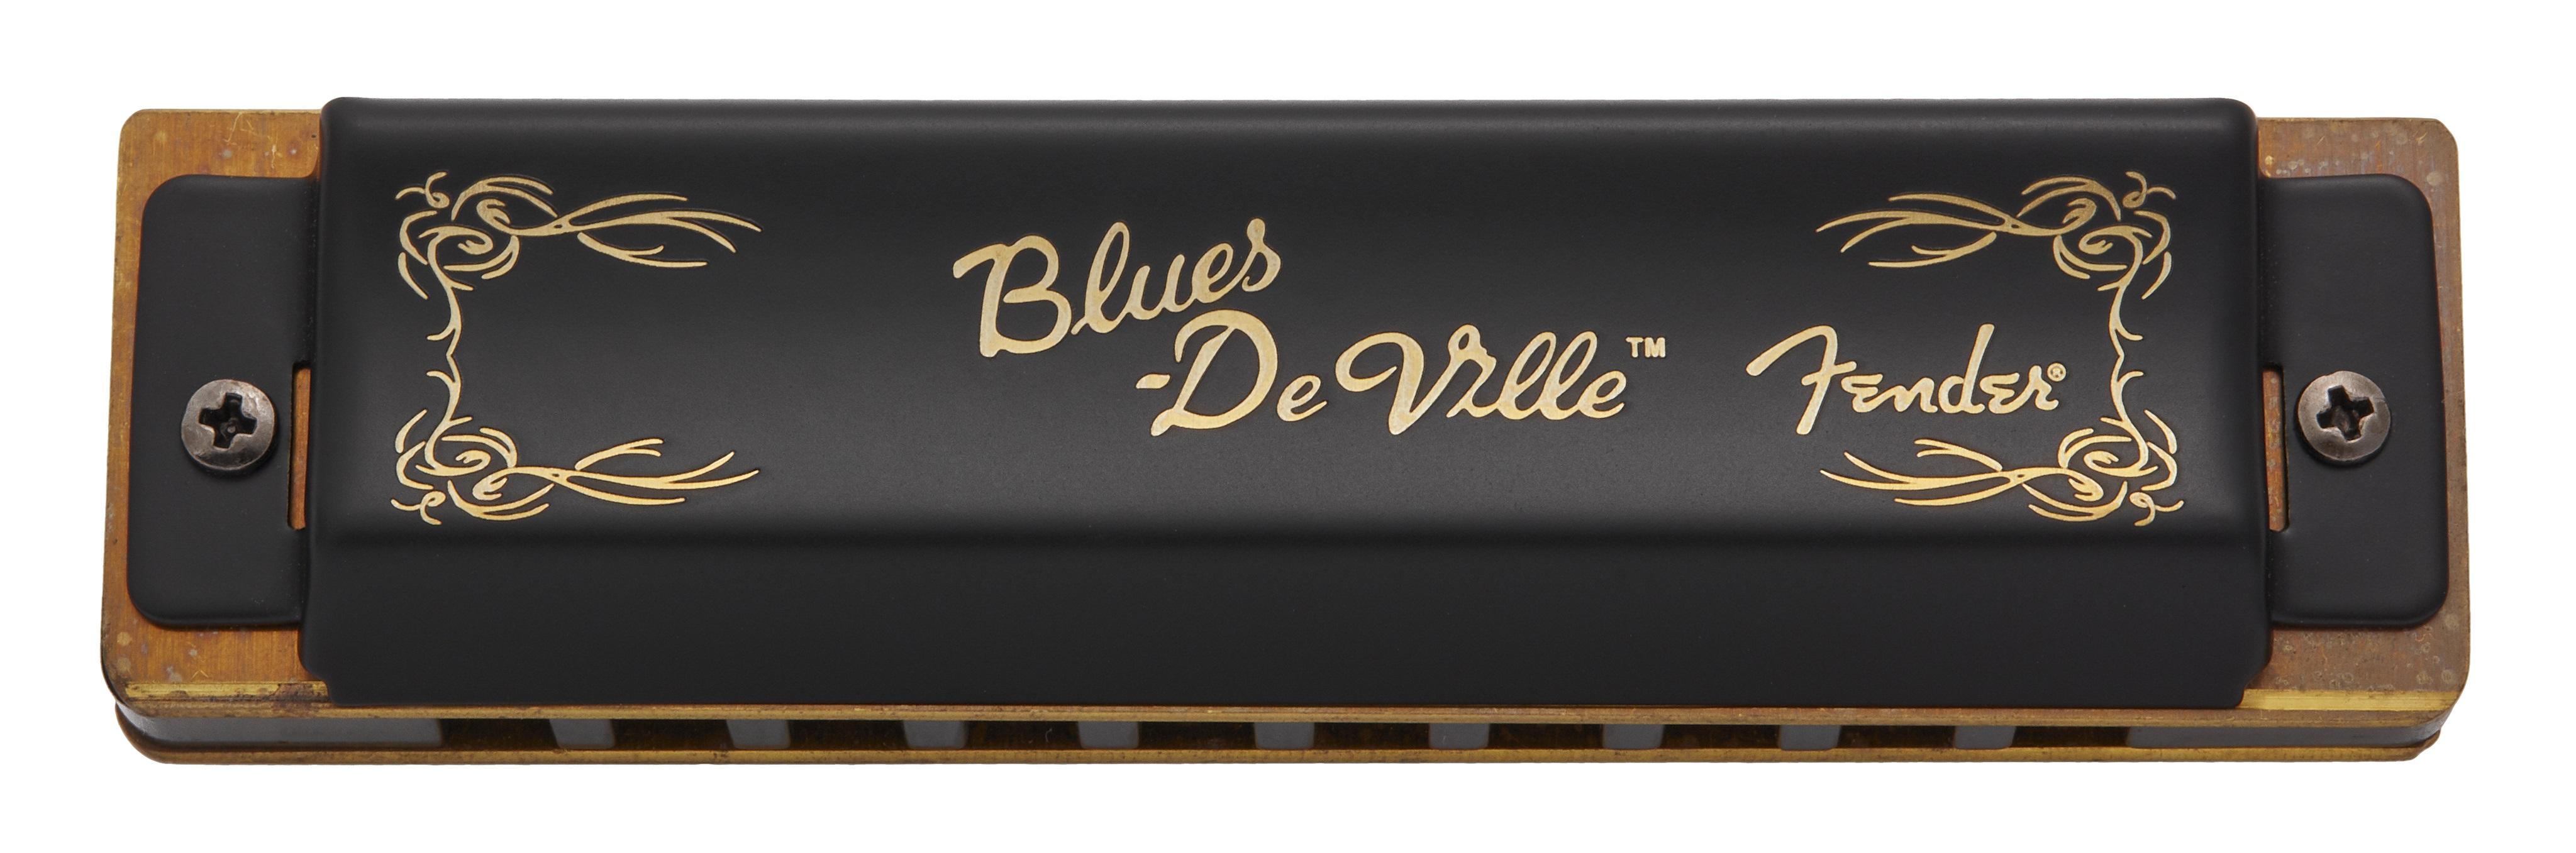 Fender Blues DeVille Key of C